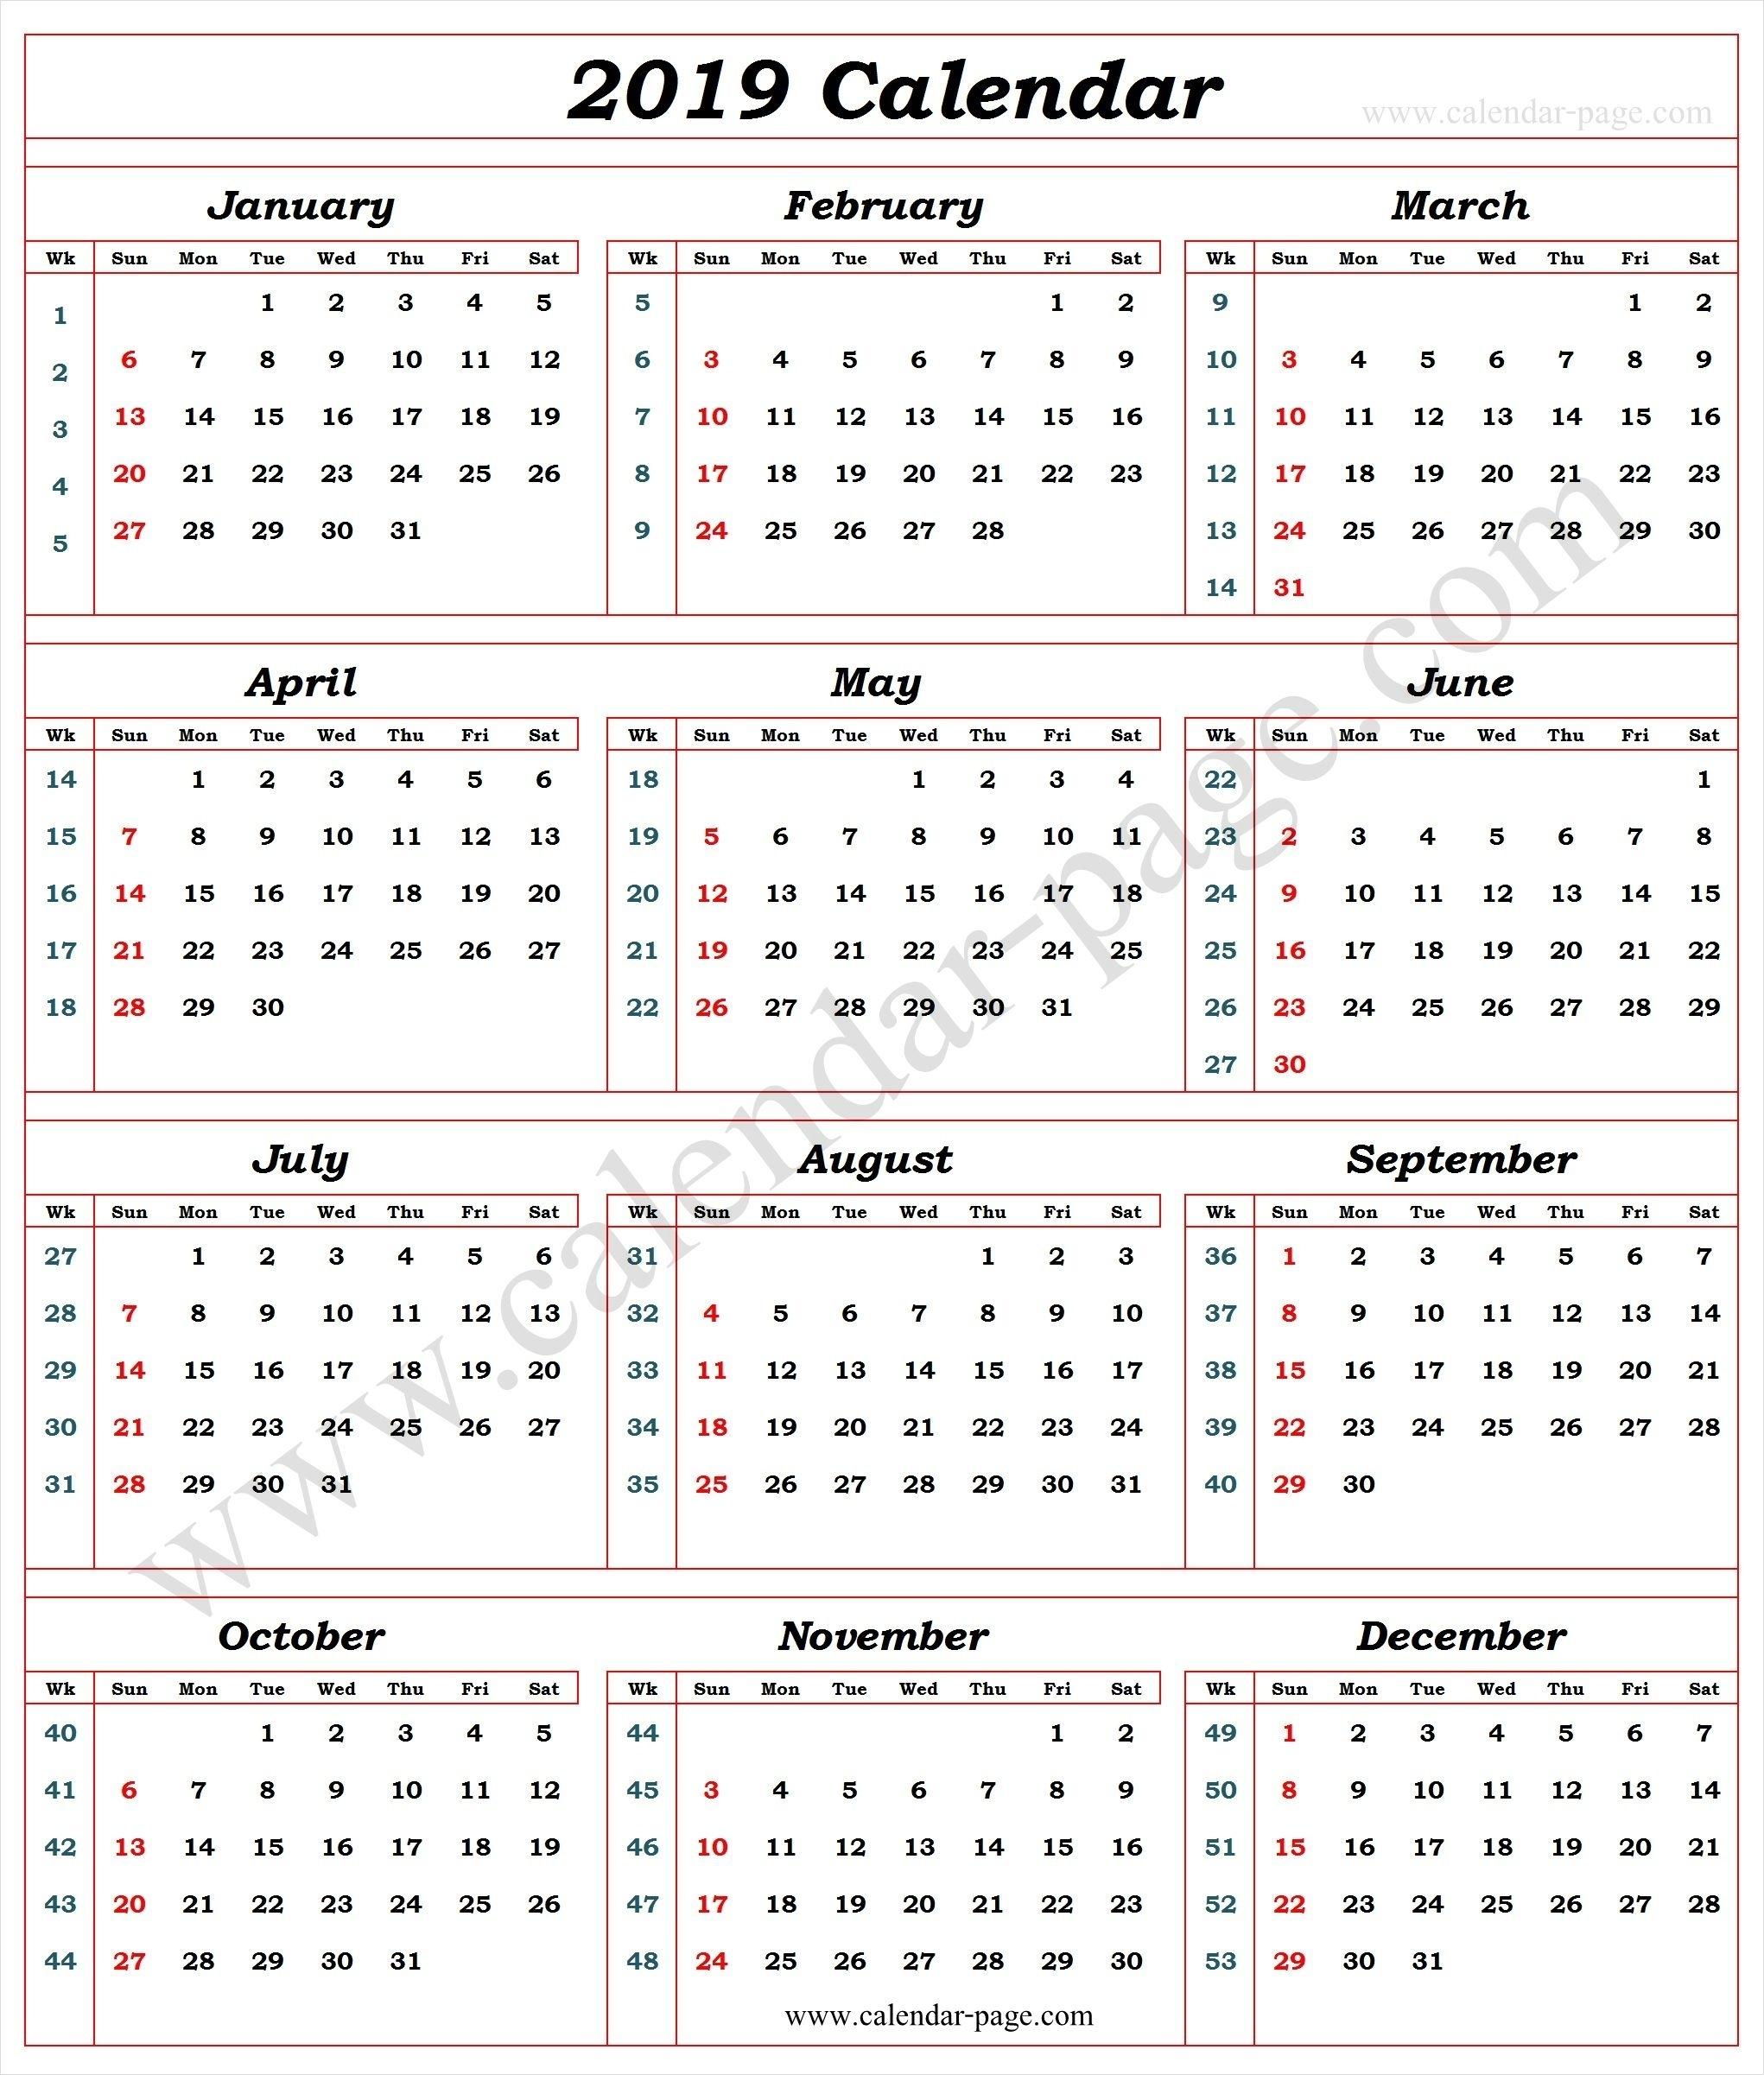 Week Number Calendar - Colona.rsd7 for European Style Calendar With Week Number For Excel